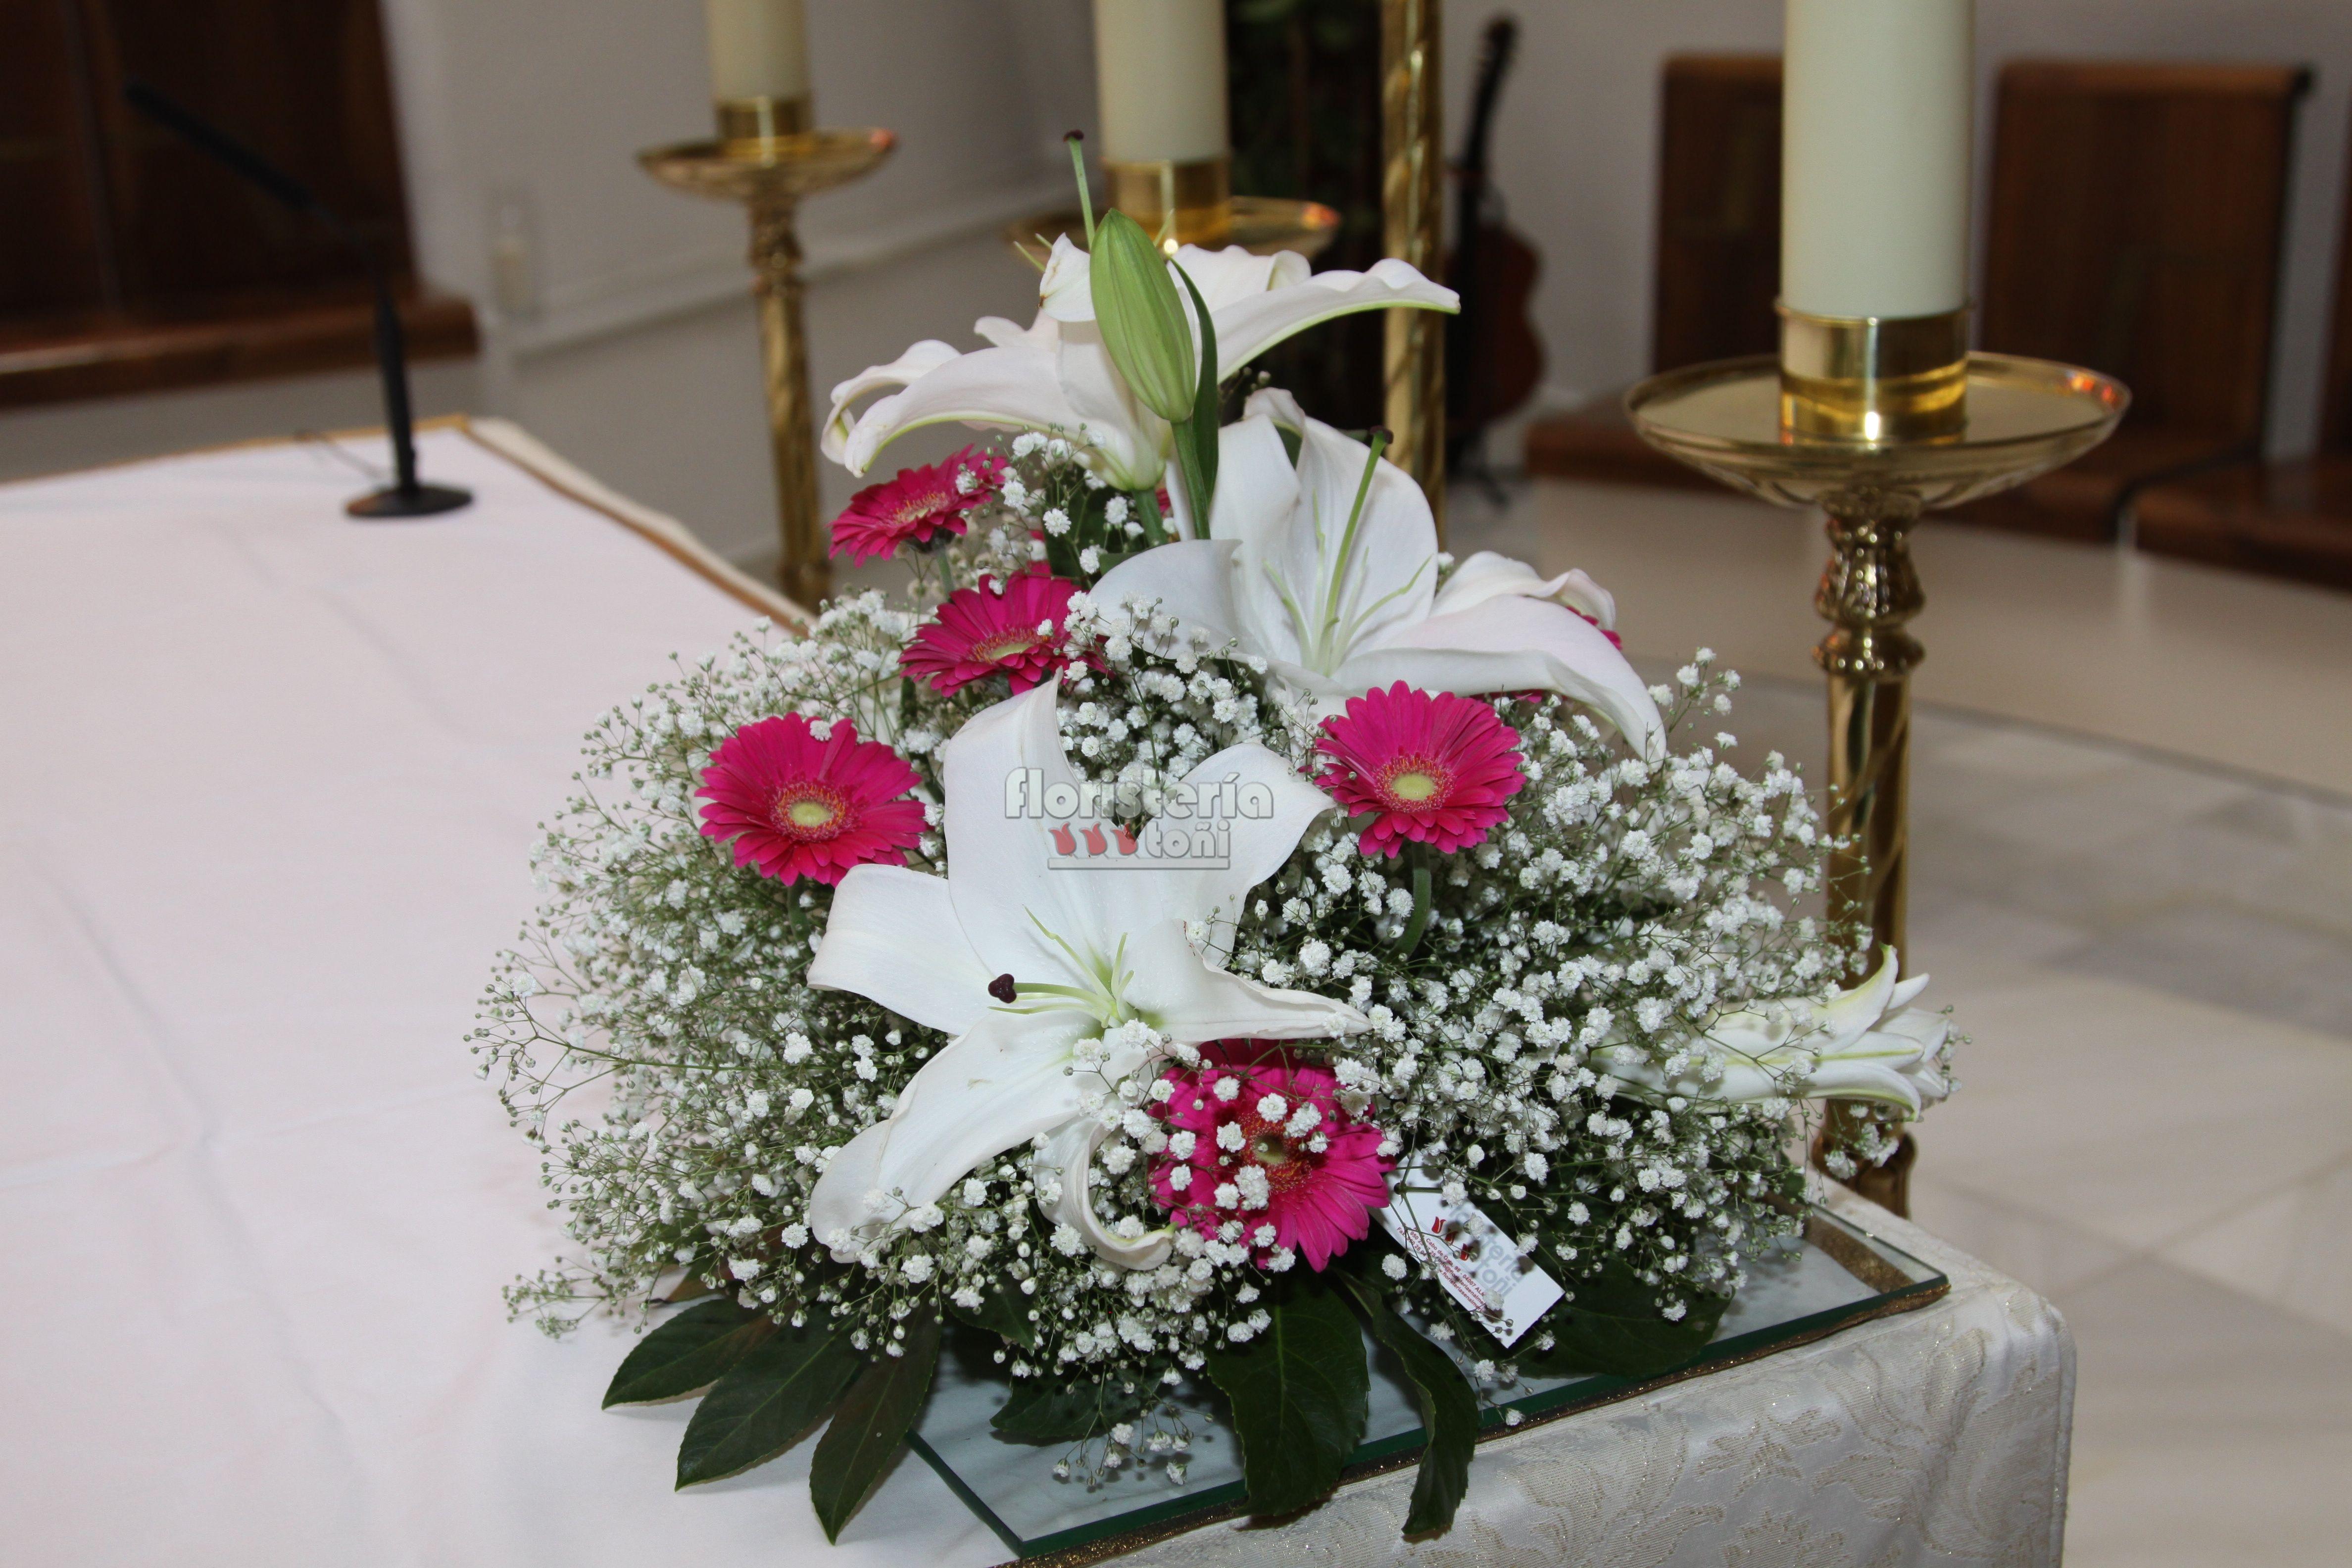 Centro de mesa altar gerberas paniculata y lilium - Centros para decorar mesas ...